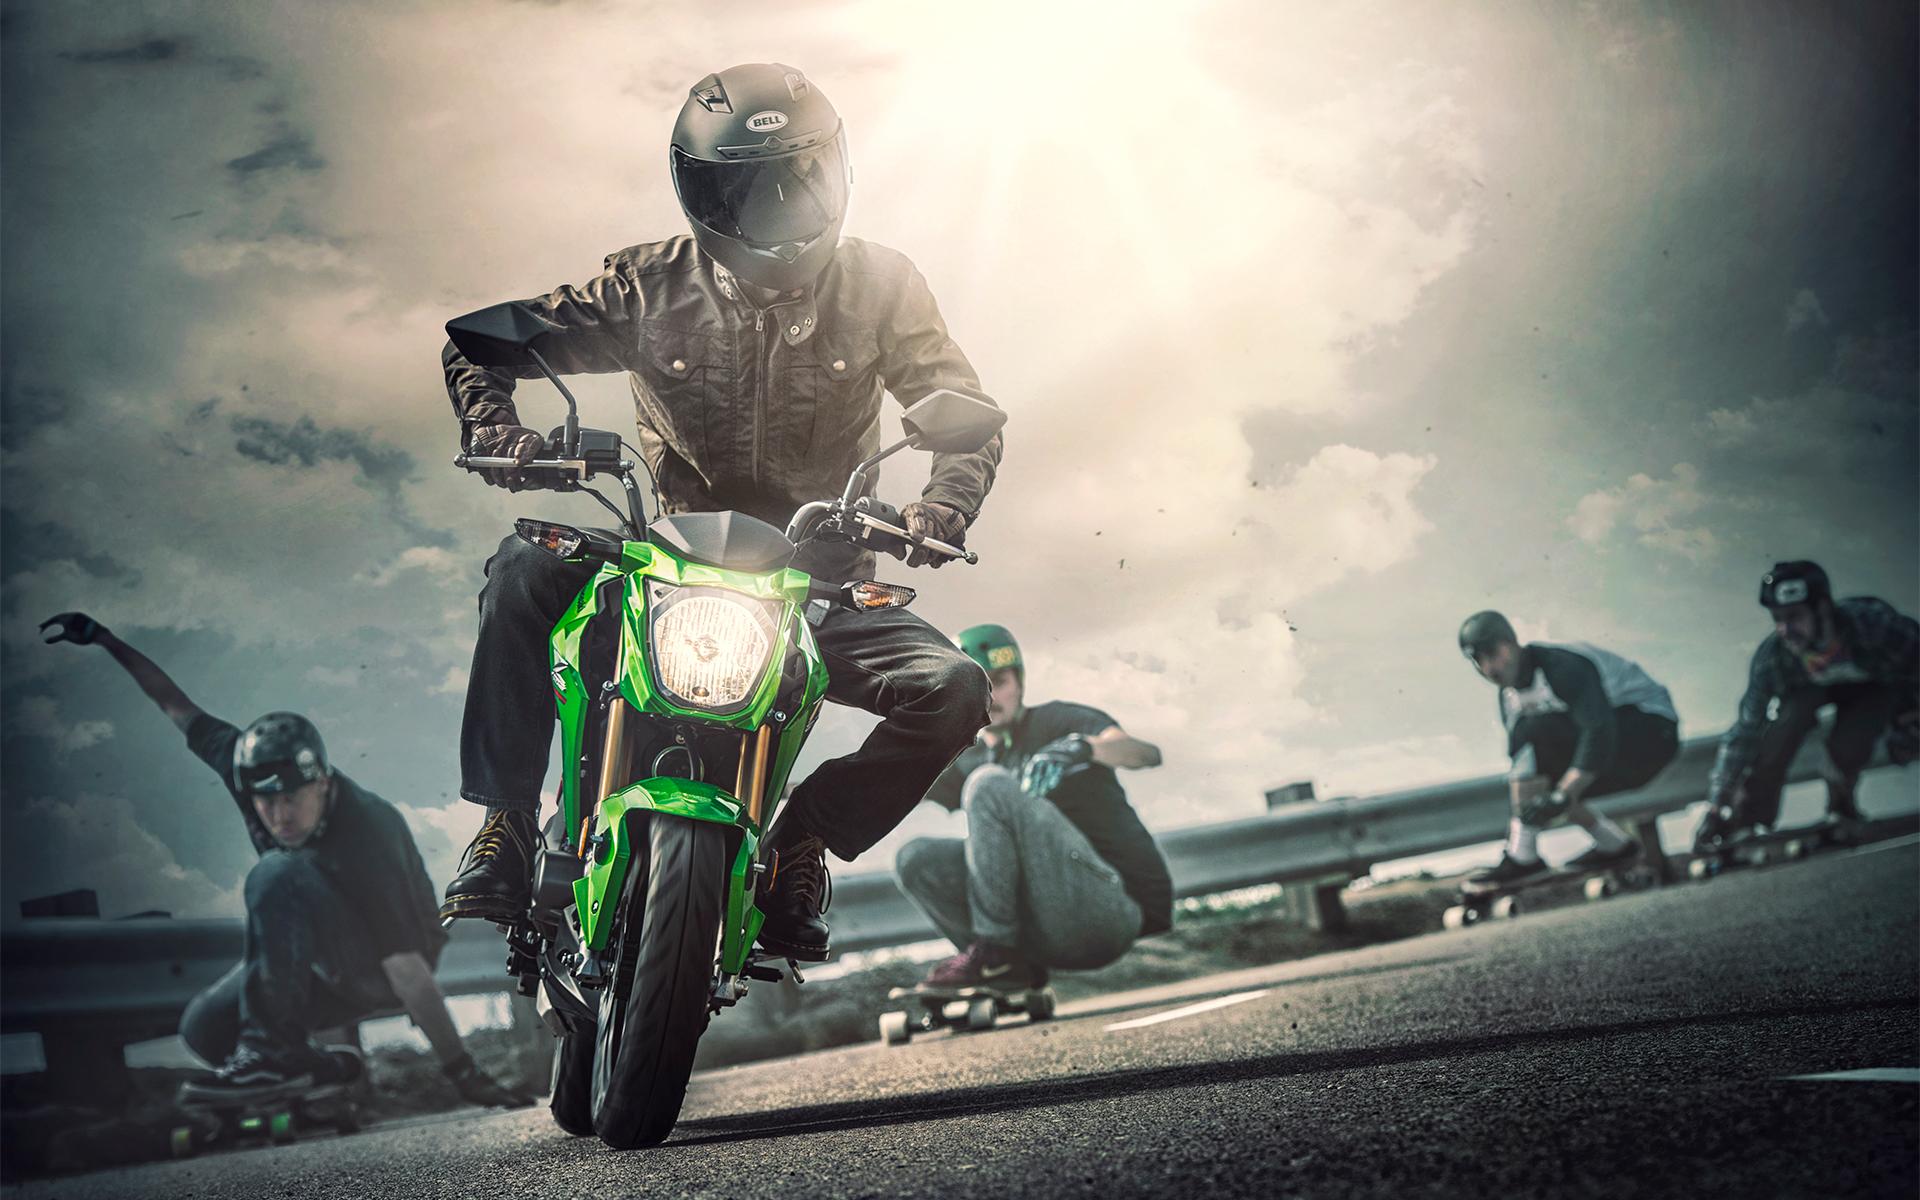 2017 Z125 PRO Motorcycle - Kawasaki Latin America